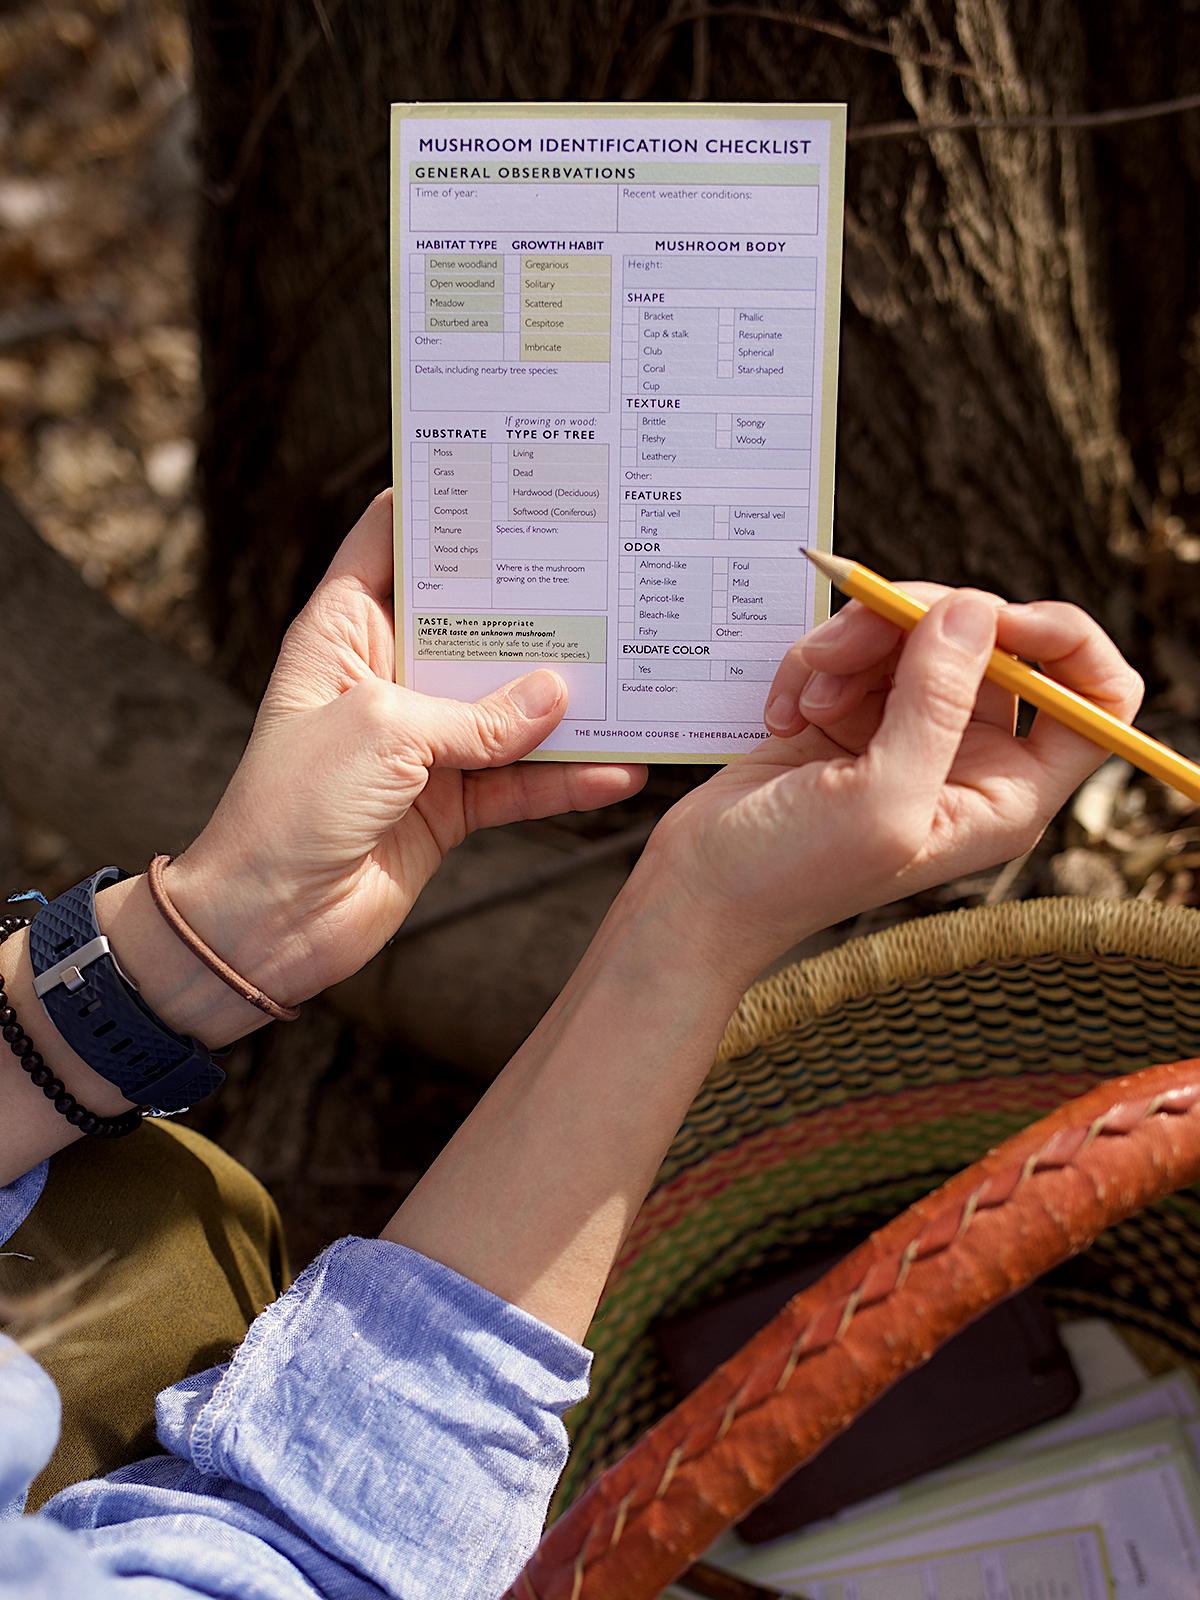 Mushroom Identification Checklist Pad by Herbal Academy